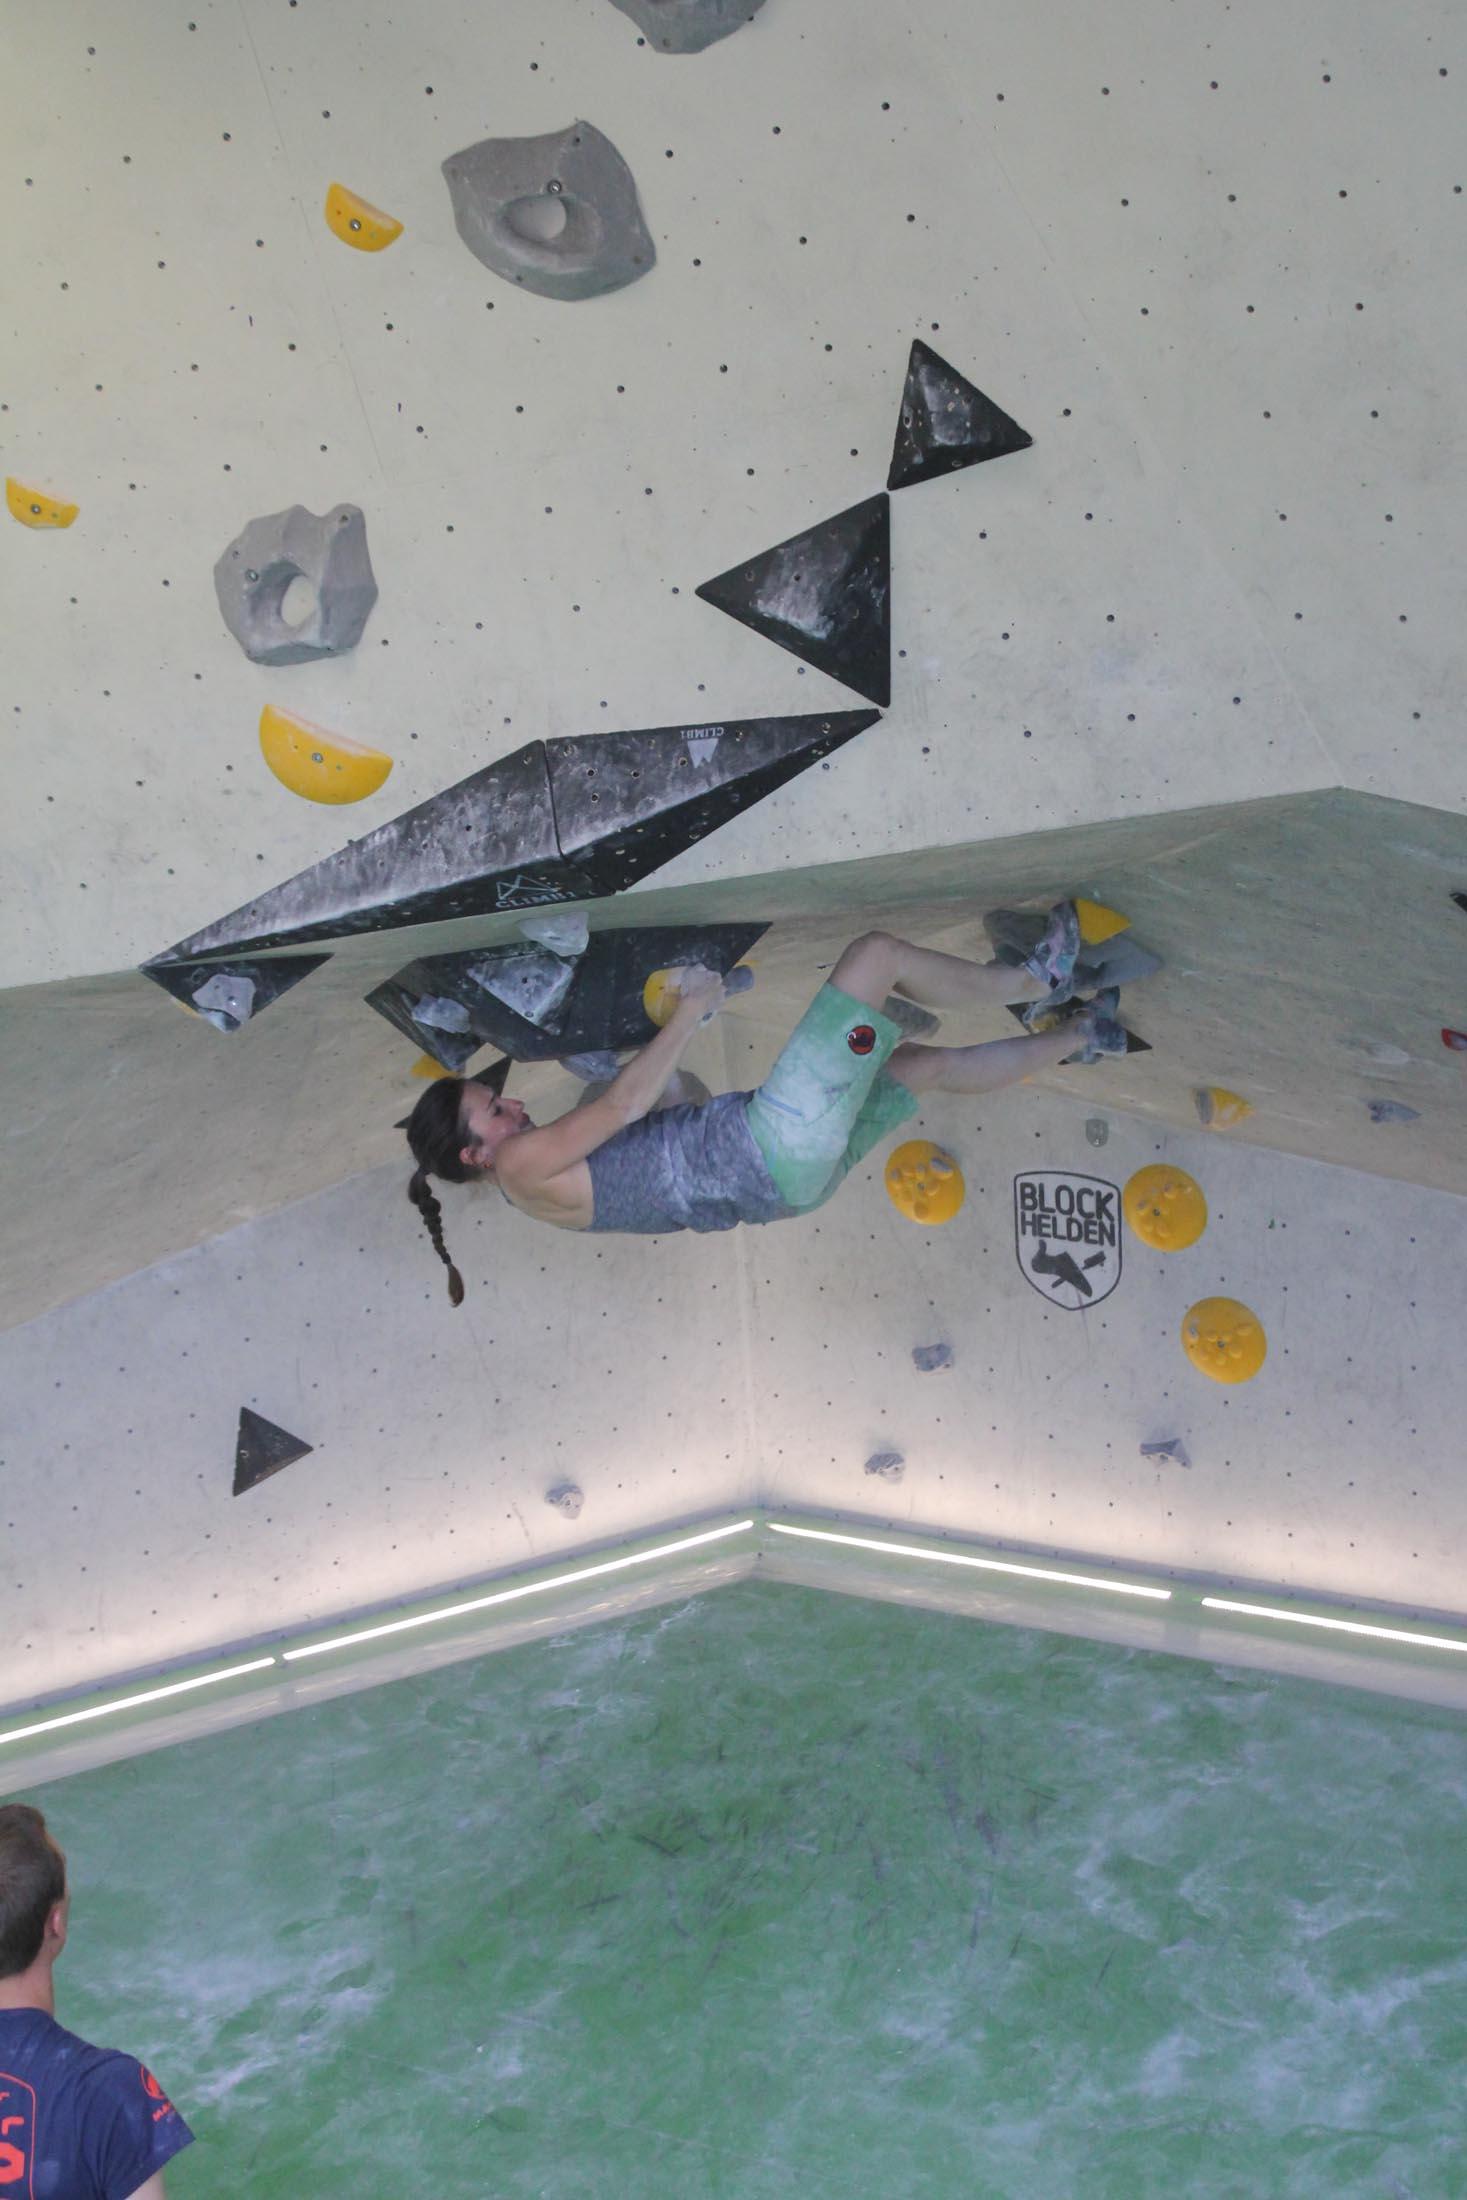 Quali, internationaler bouldercup Frankenjura 2016, BLOCKHELDEN Erlangen, Mammut, Bergfreunde.de, Boulderwettkampf07092016308